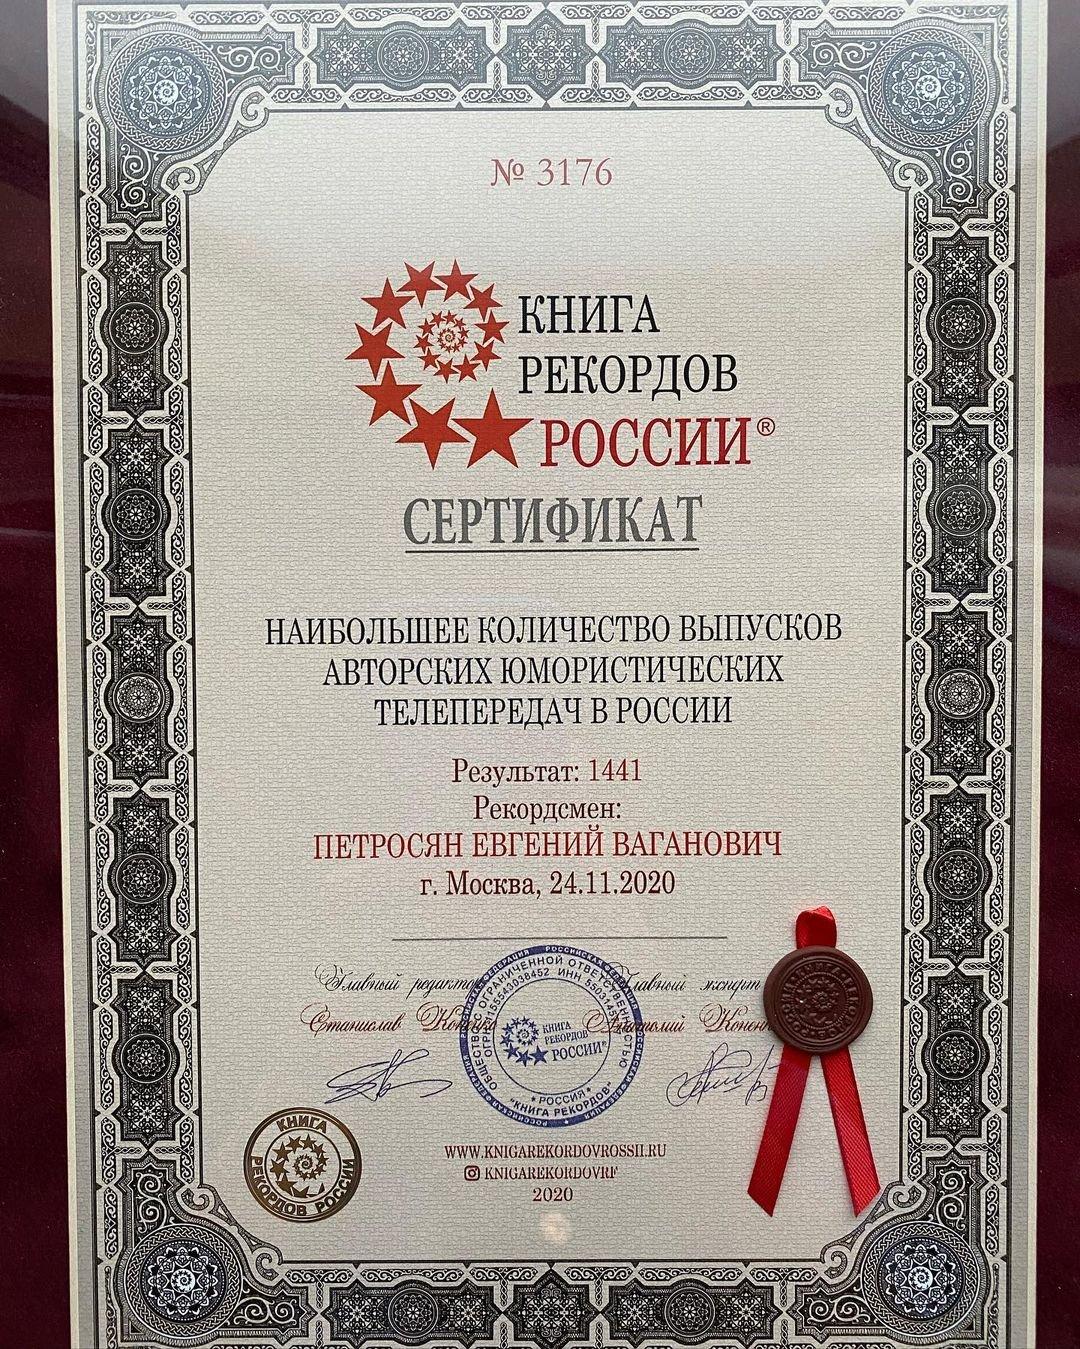 Евгений Петросян стал рекордсменом России